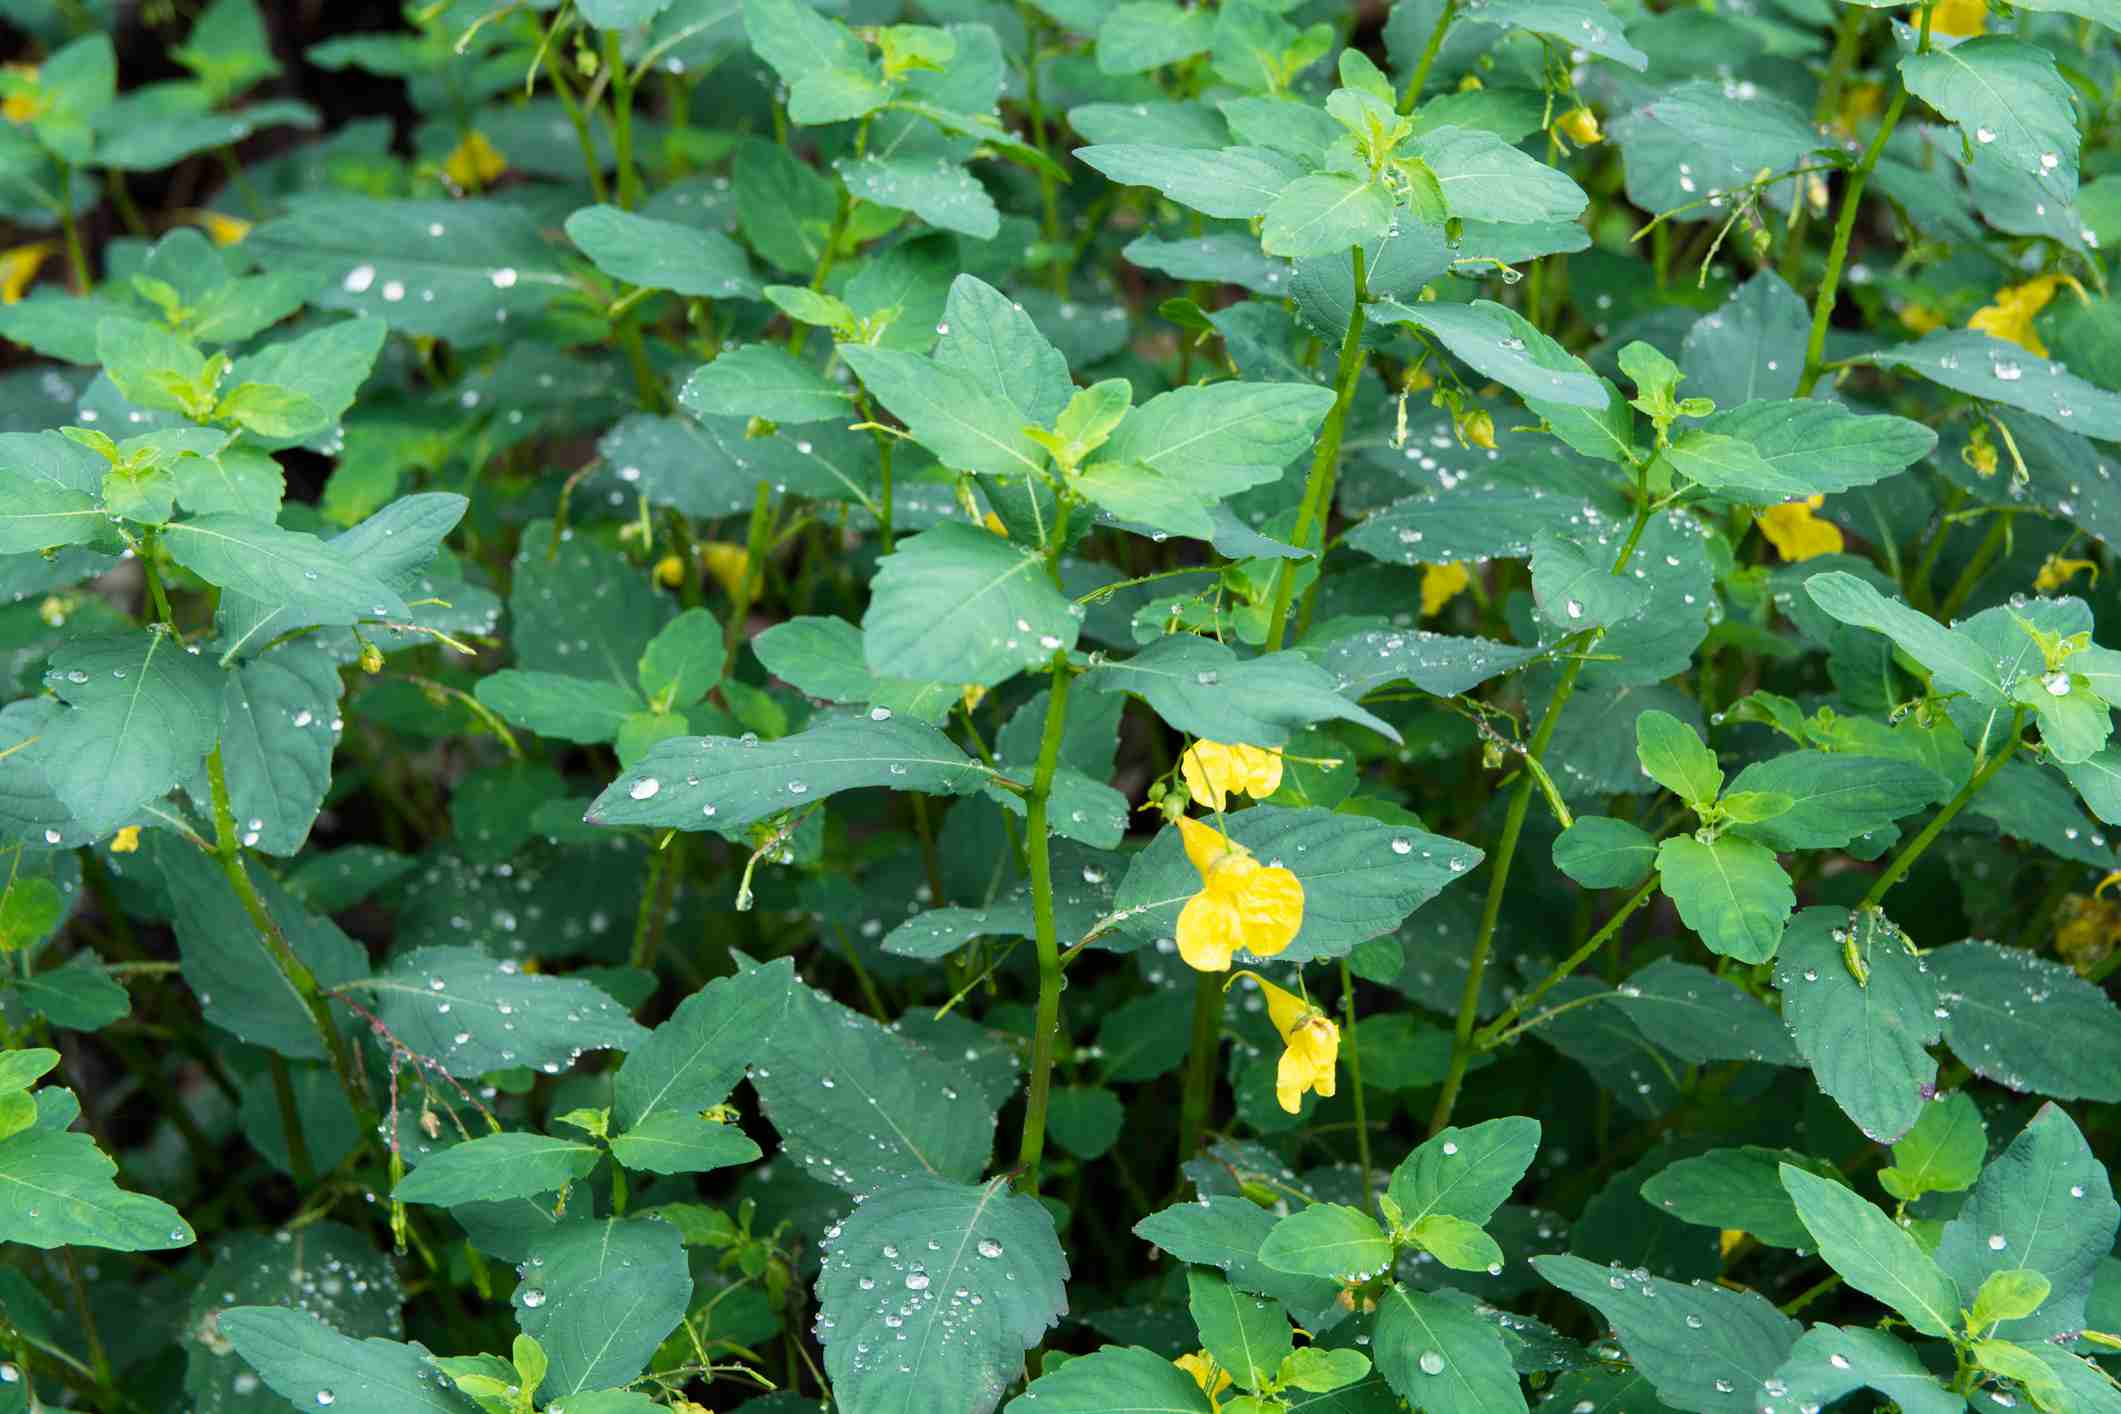 Parche de joya amarilla en flor